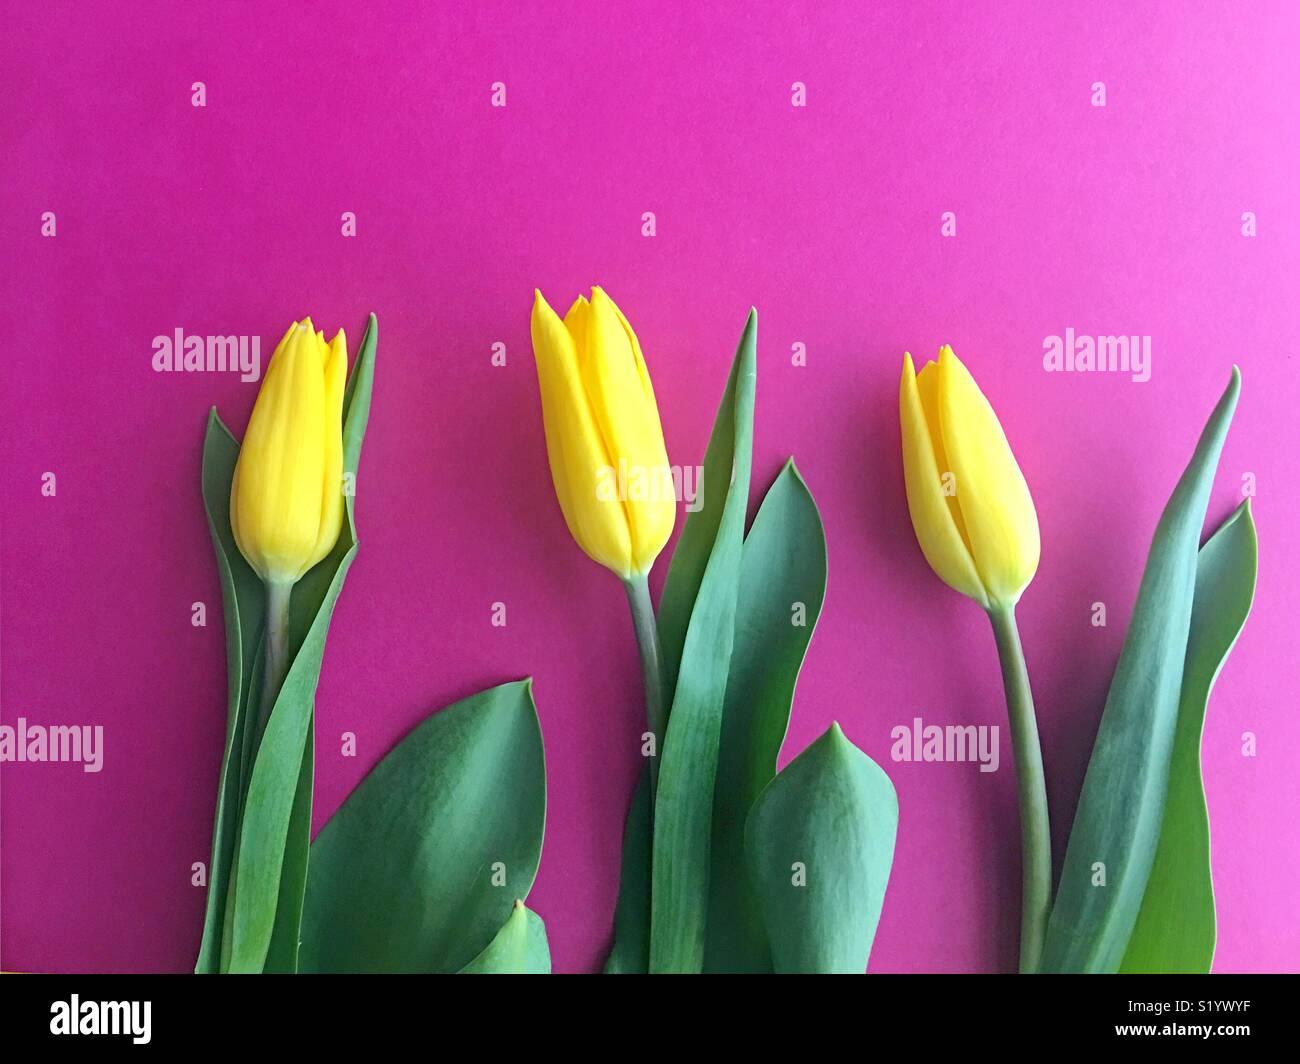 Three tulips. - Stock Image